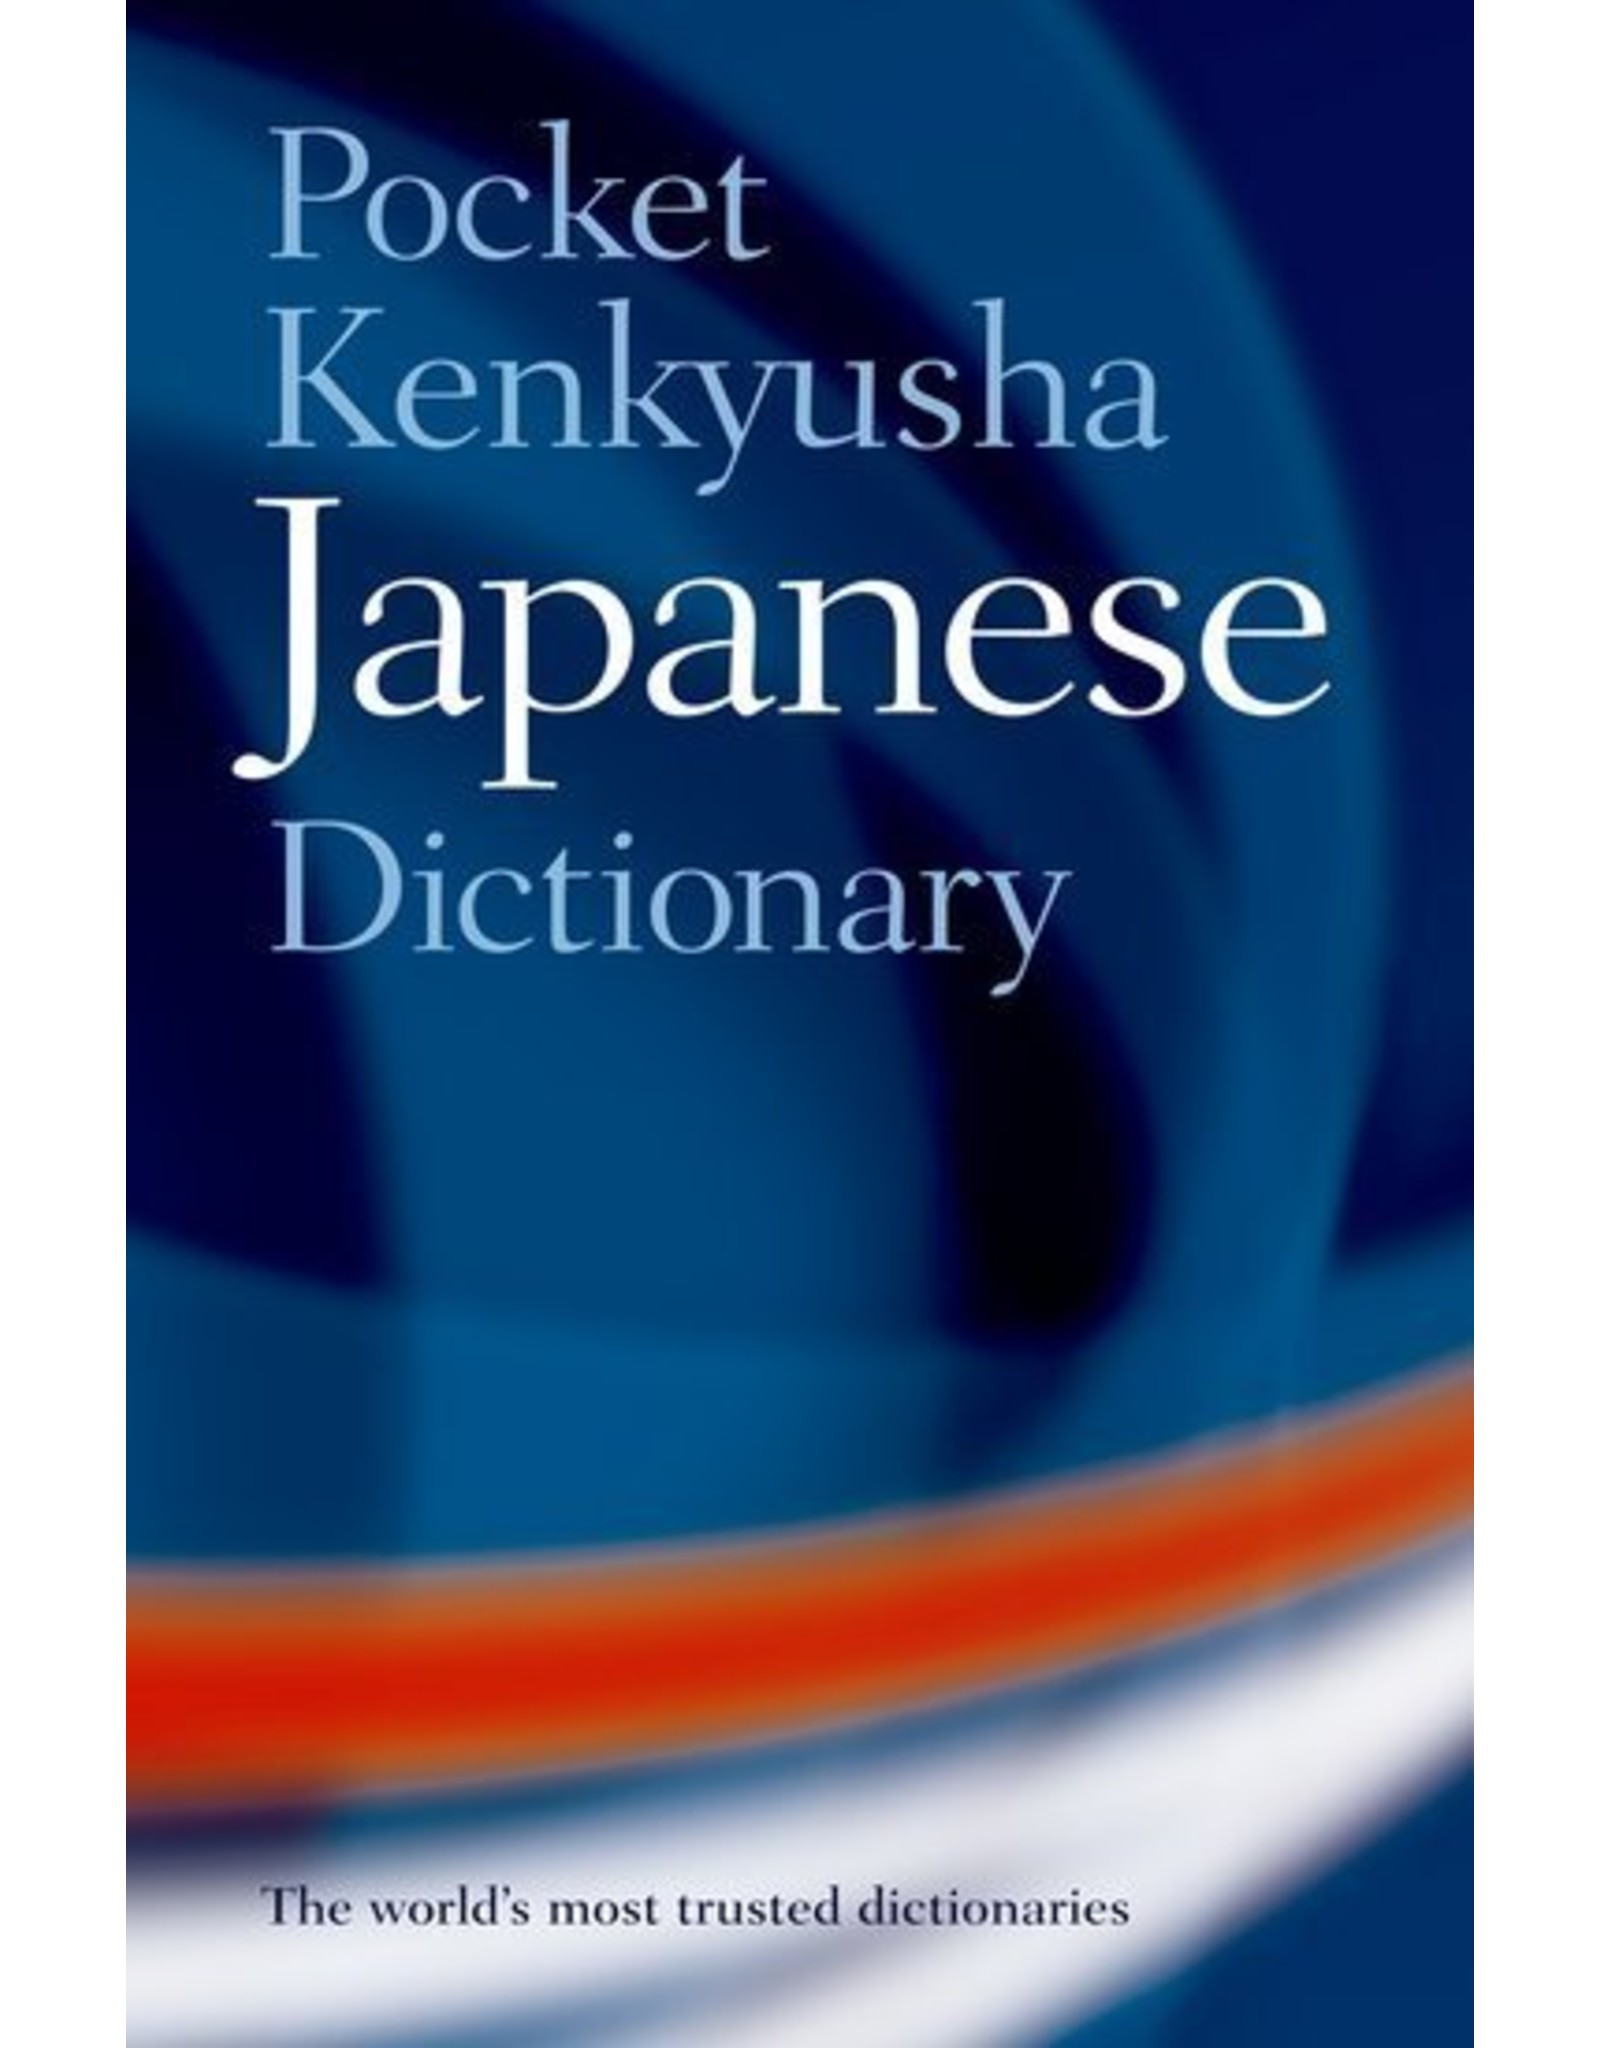 Oxford University Press POCKET KENKYUSHA JAPANESE DICTIONARY